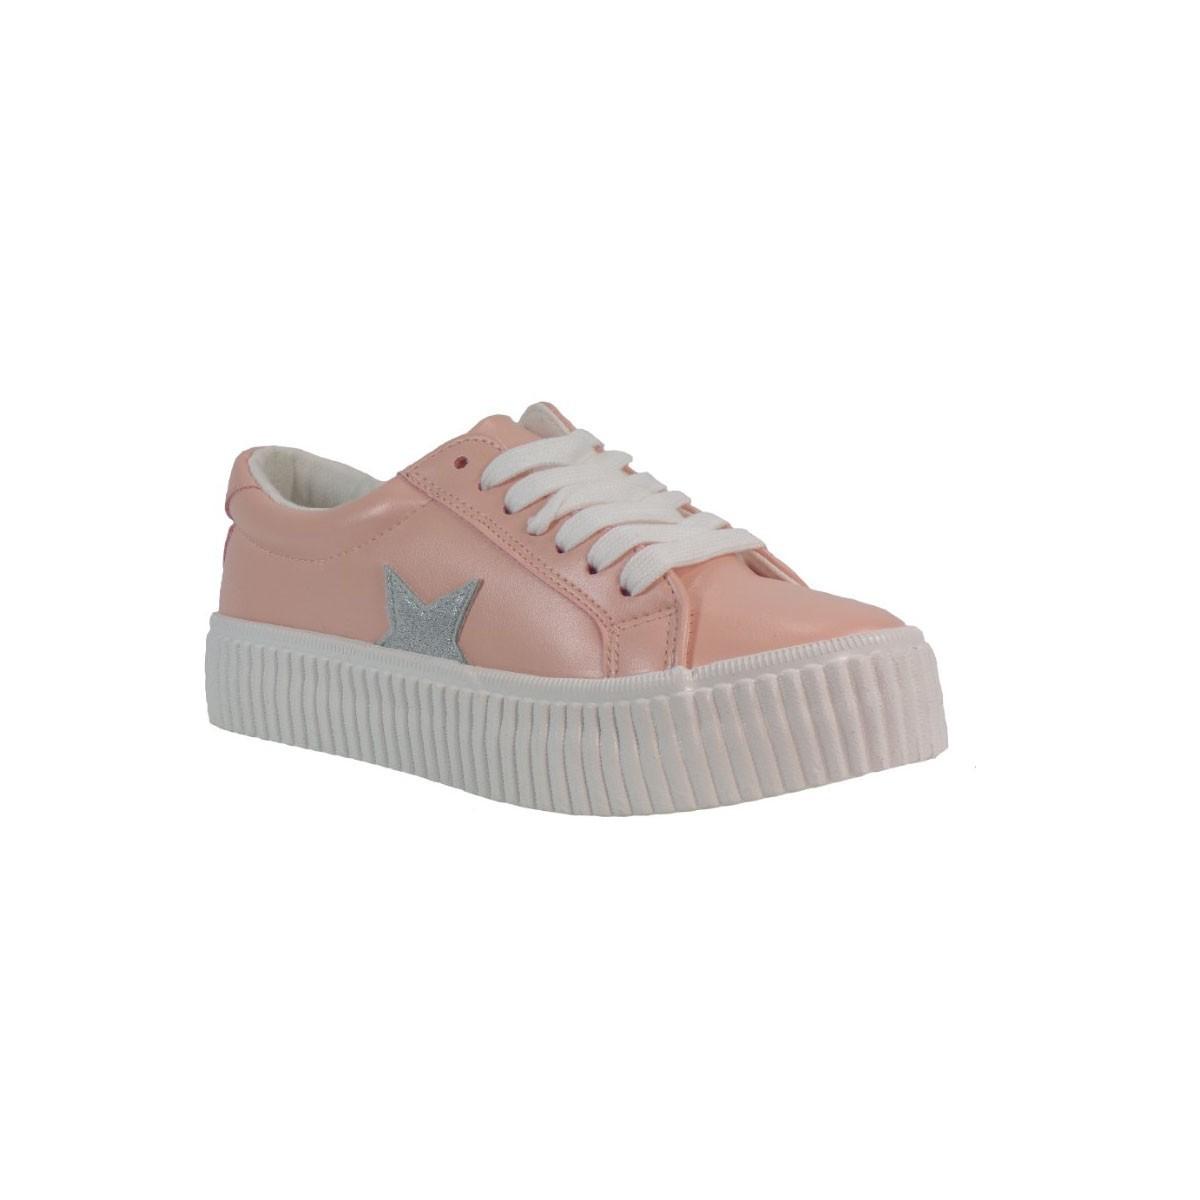 Coolway Sneakers Γυναικεία Παπούτσια CHERRY 137 Σομων Coolway Cherry 137 Σ